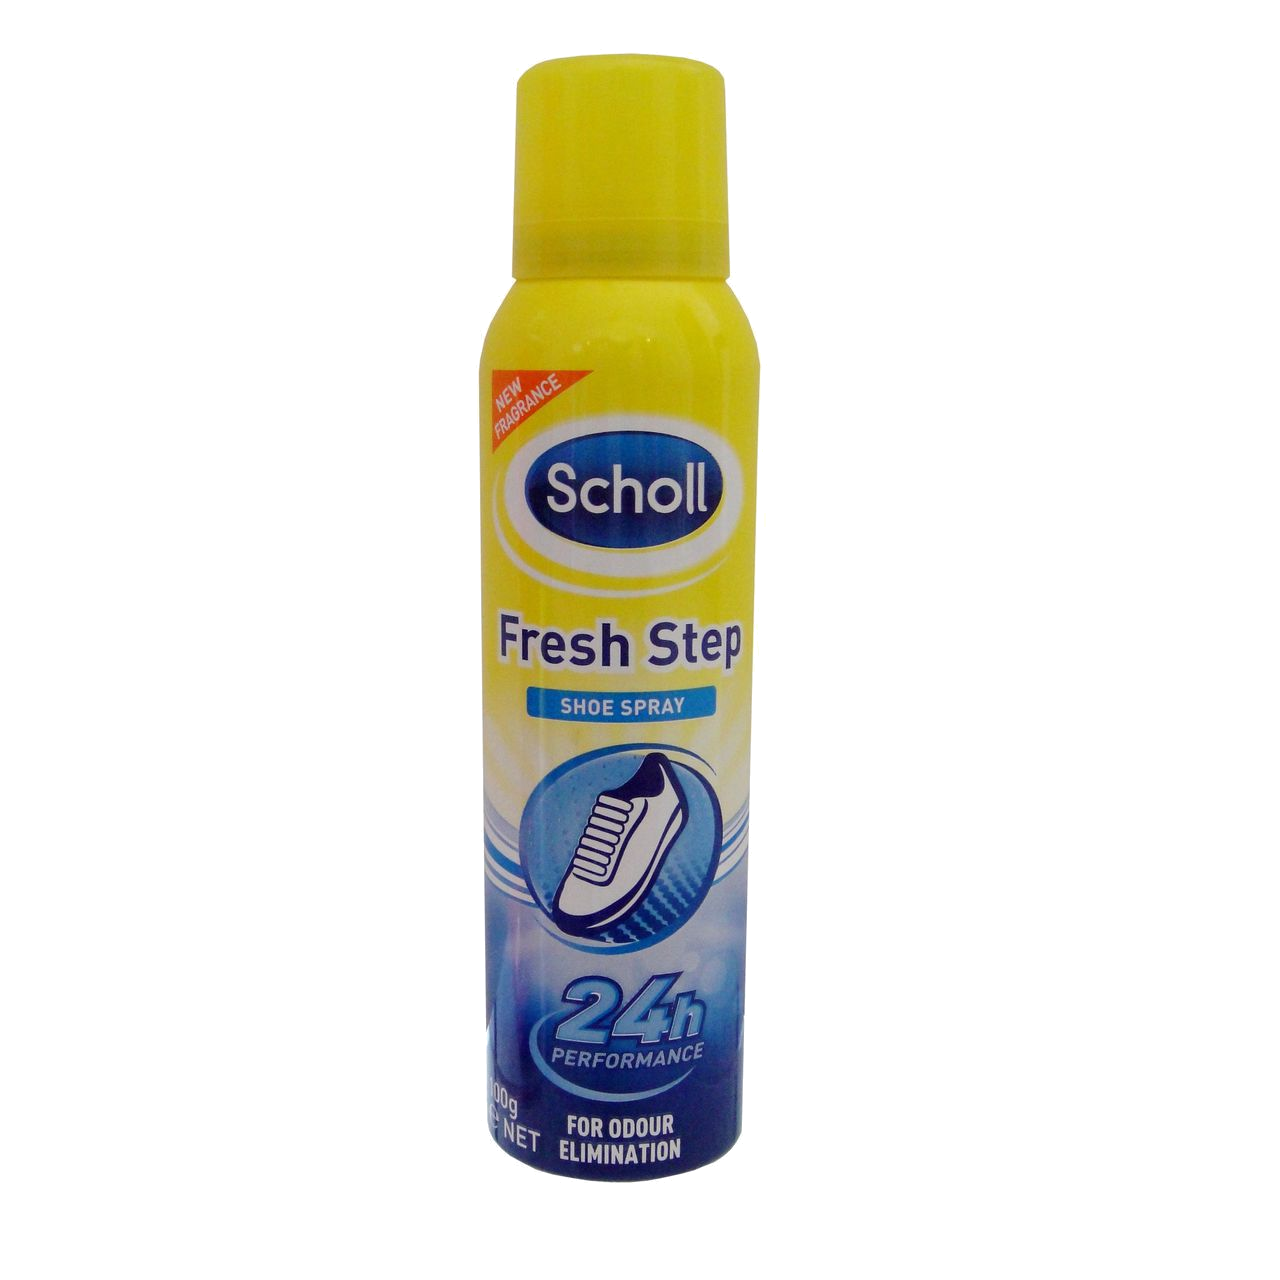 [MPLUS] Scholl Fresh Step Shoe Spray 24Hr 150Ml